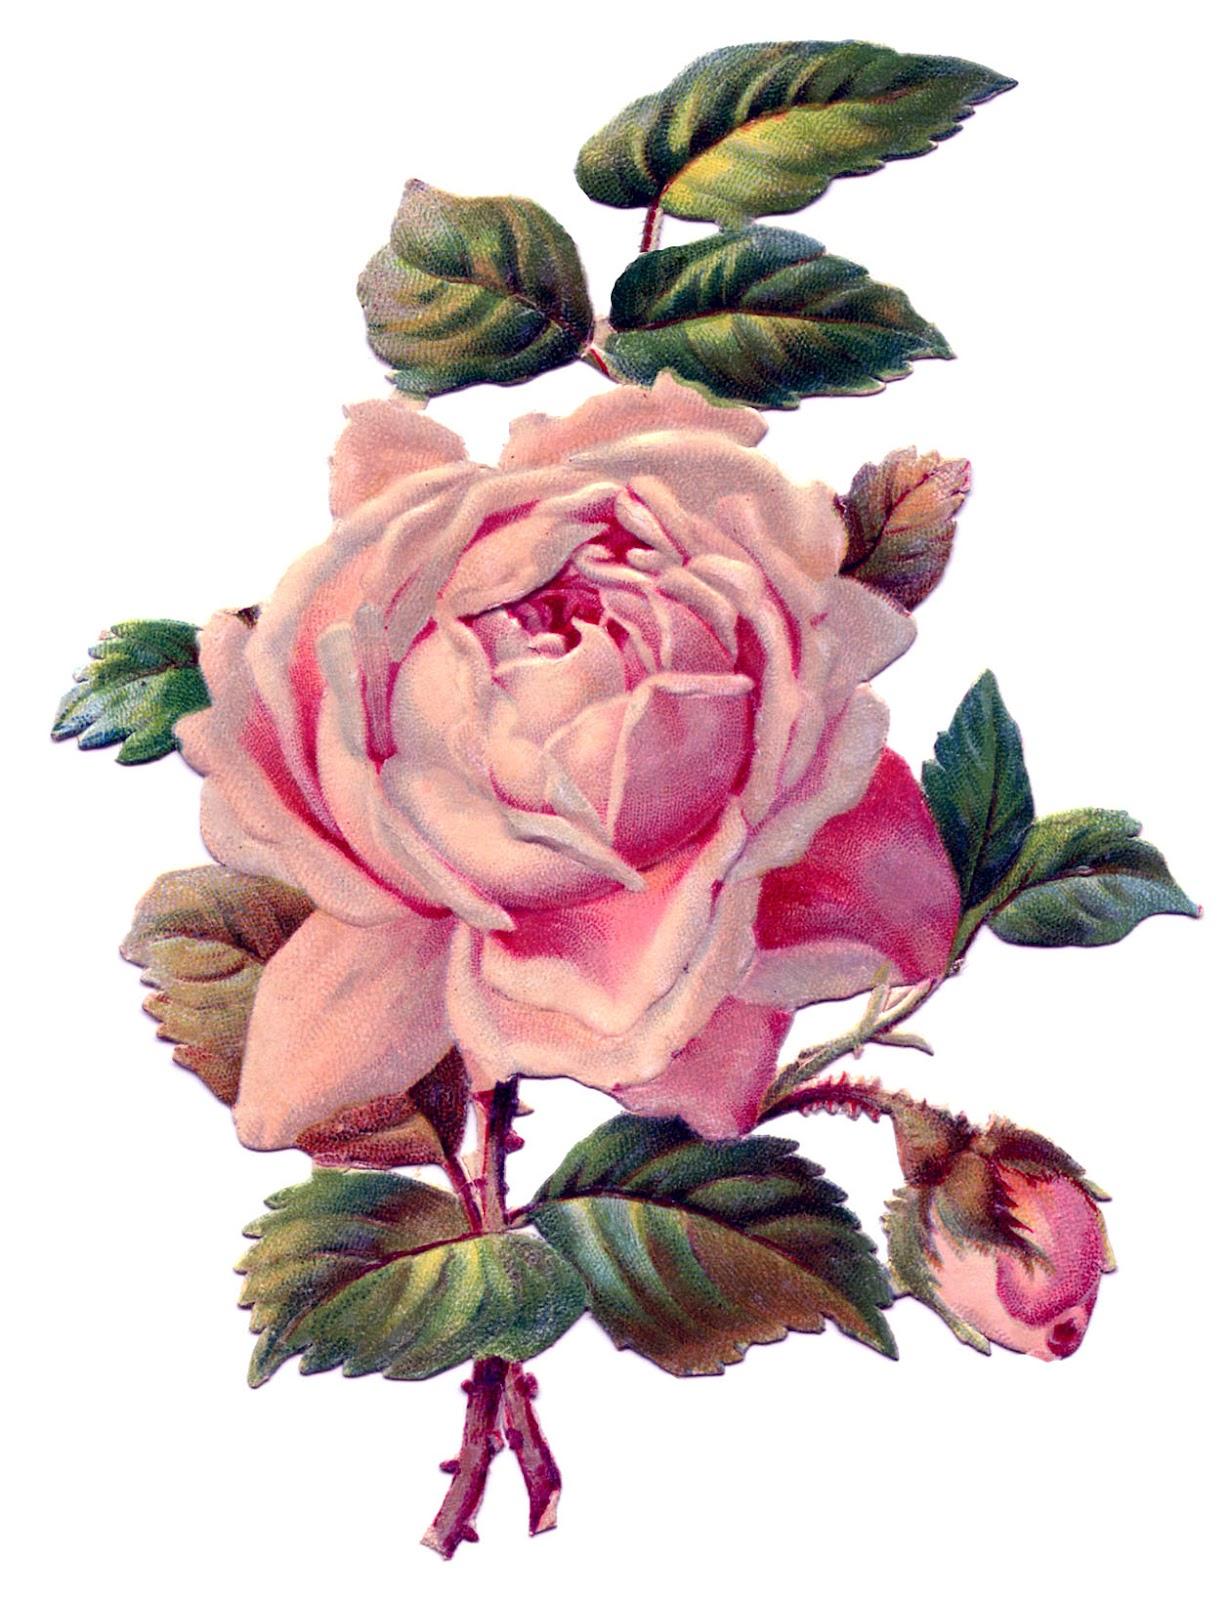 http://4.bp.blogspot.com/-1W2ewVHDSq8/T6B5hHt3r0I/AAAAAAAARkw/B7j4I_kAPe8/s1600/pink-rosevintageimage-Graphics-Fairy2.jpg